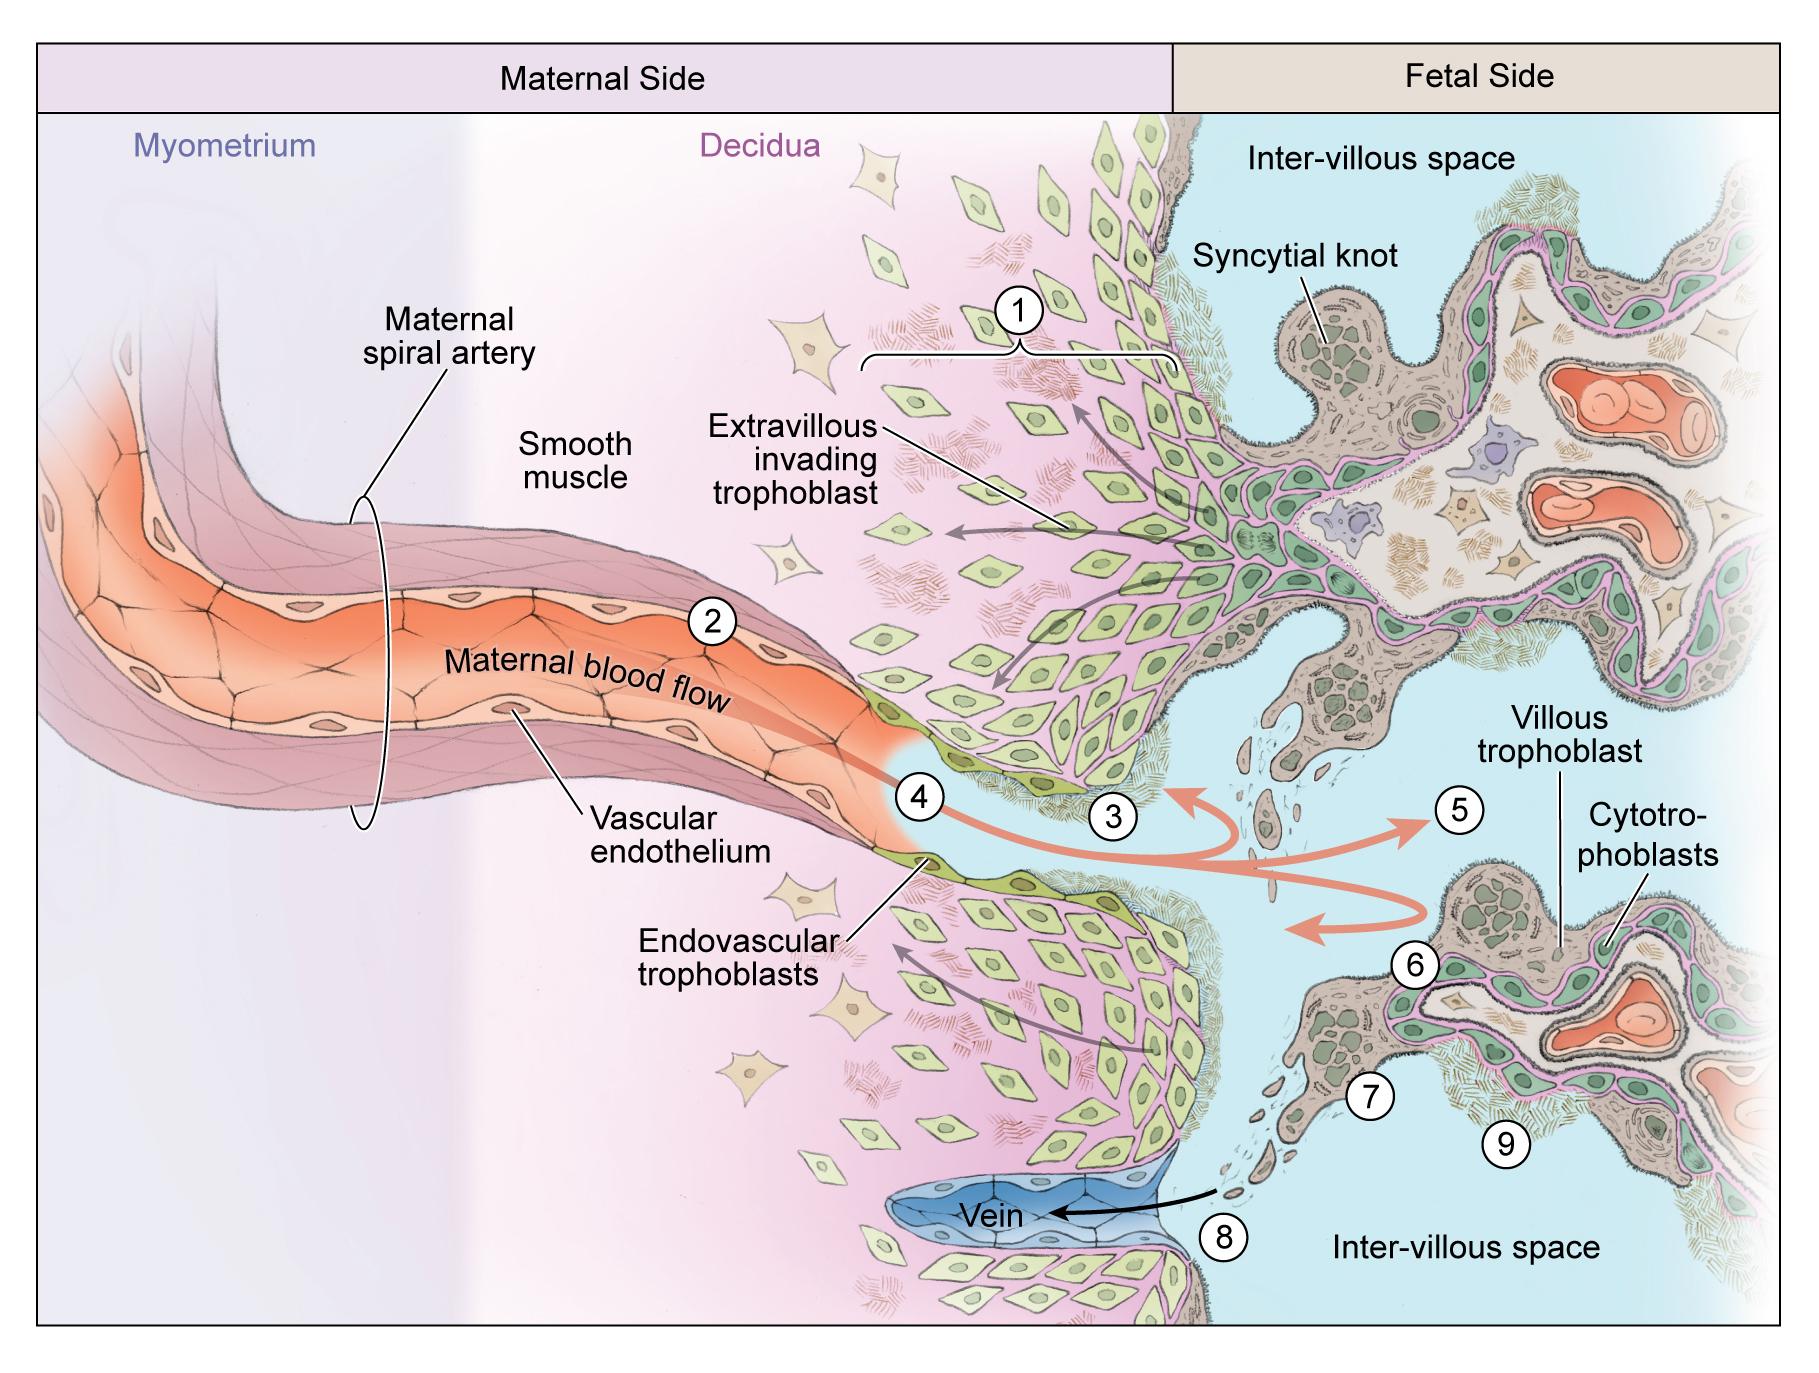 Fetal maternal interaction in severe Preeclampsia